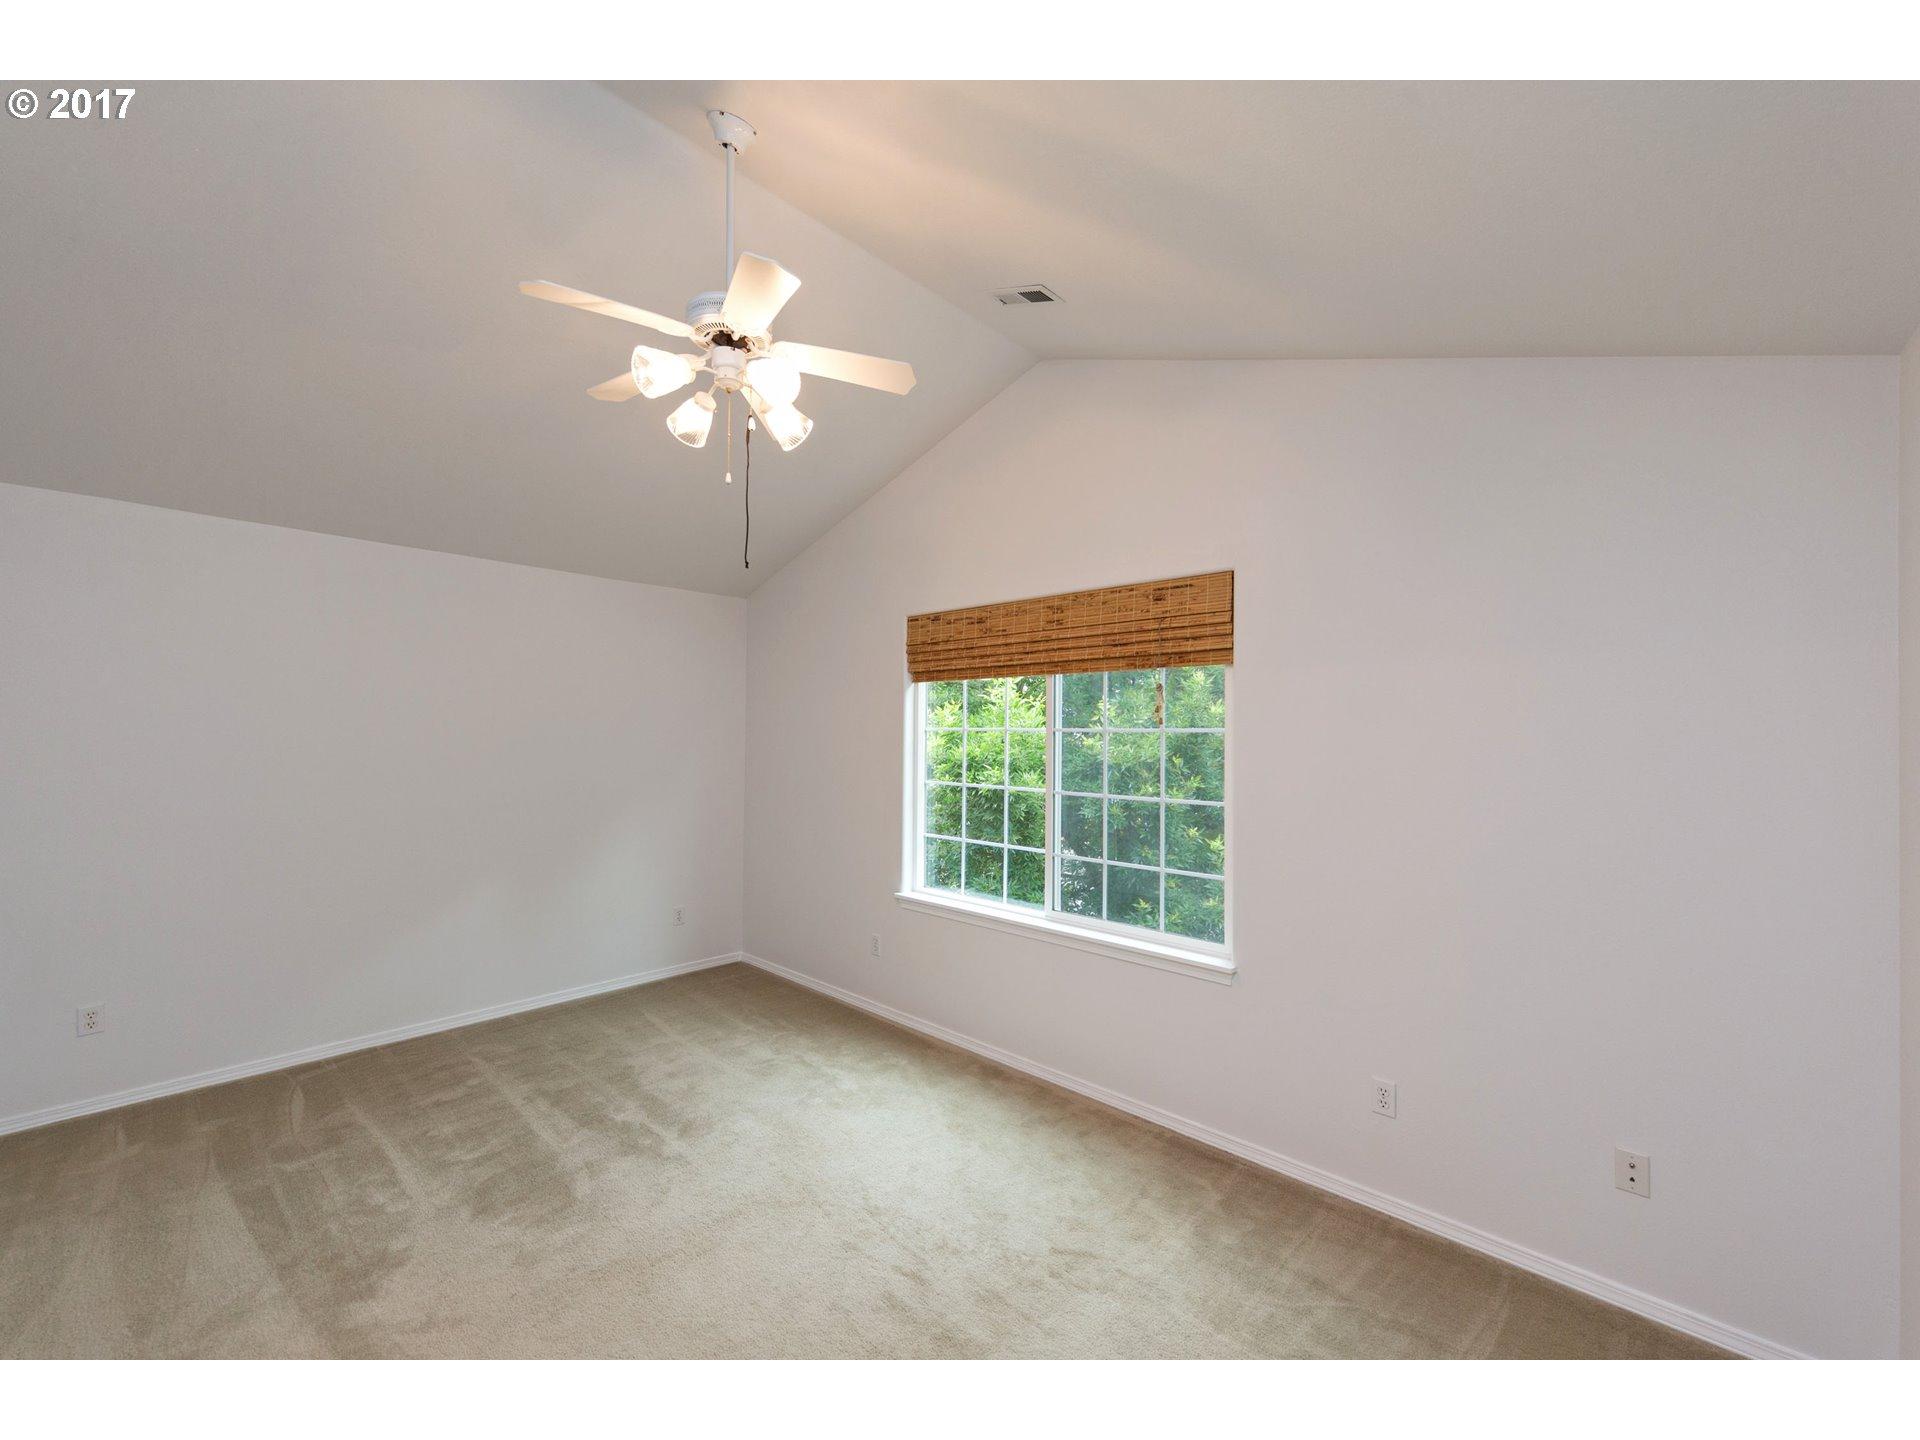 1669 SE 29TH AVE Hillsboro, OR 97123 - MLS #: 17509278